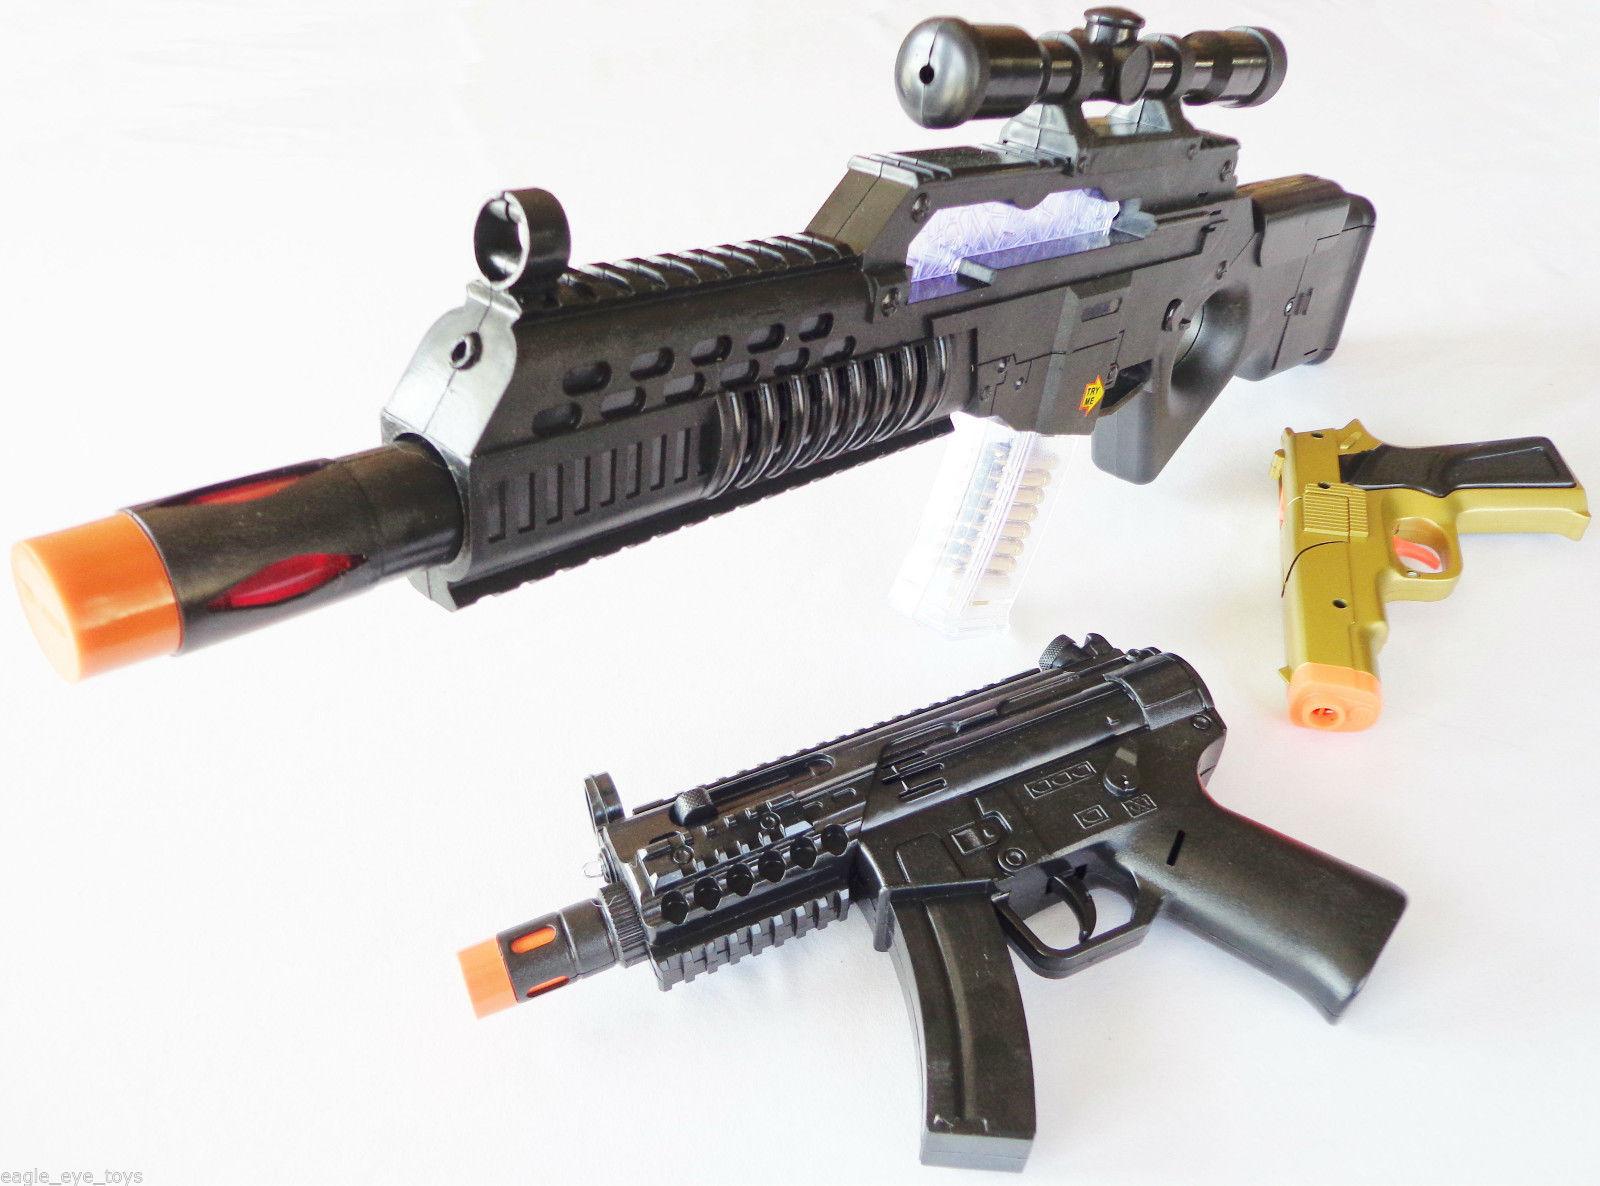 3x Toy Guns Electronic Special Forces Rifle w Sound 2x Gold 9MM Pistol Cap Gun